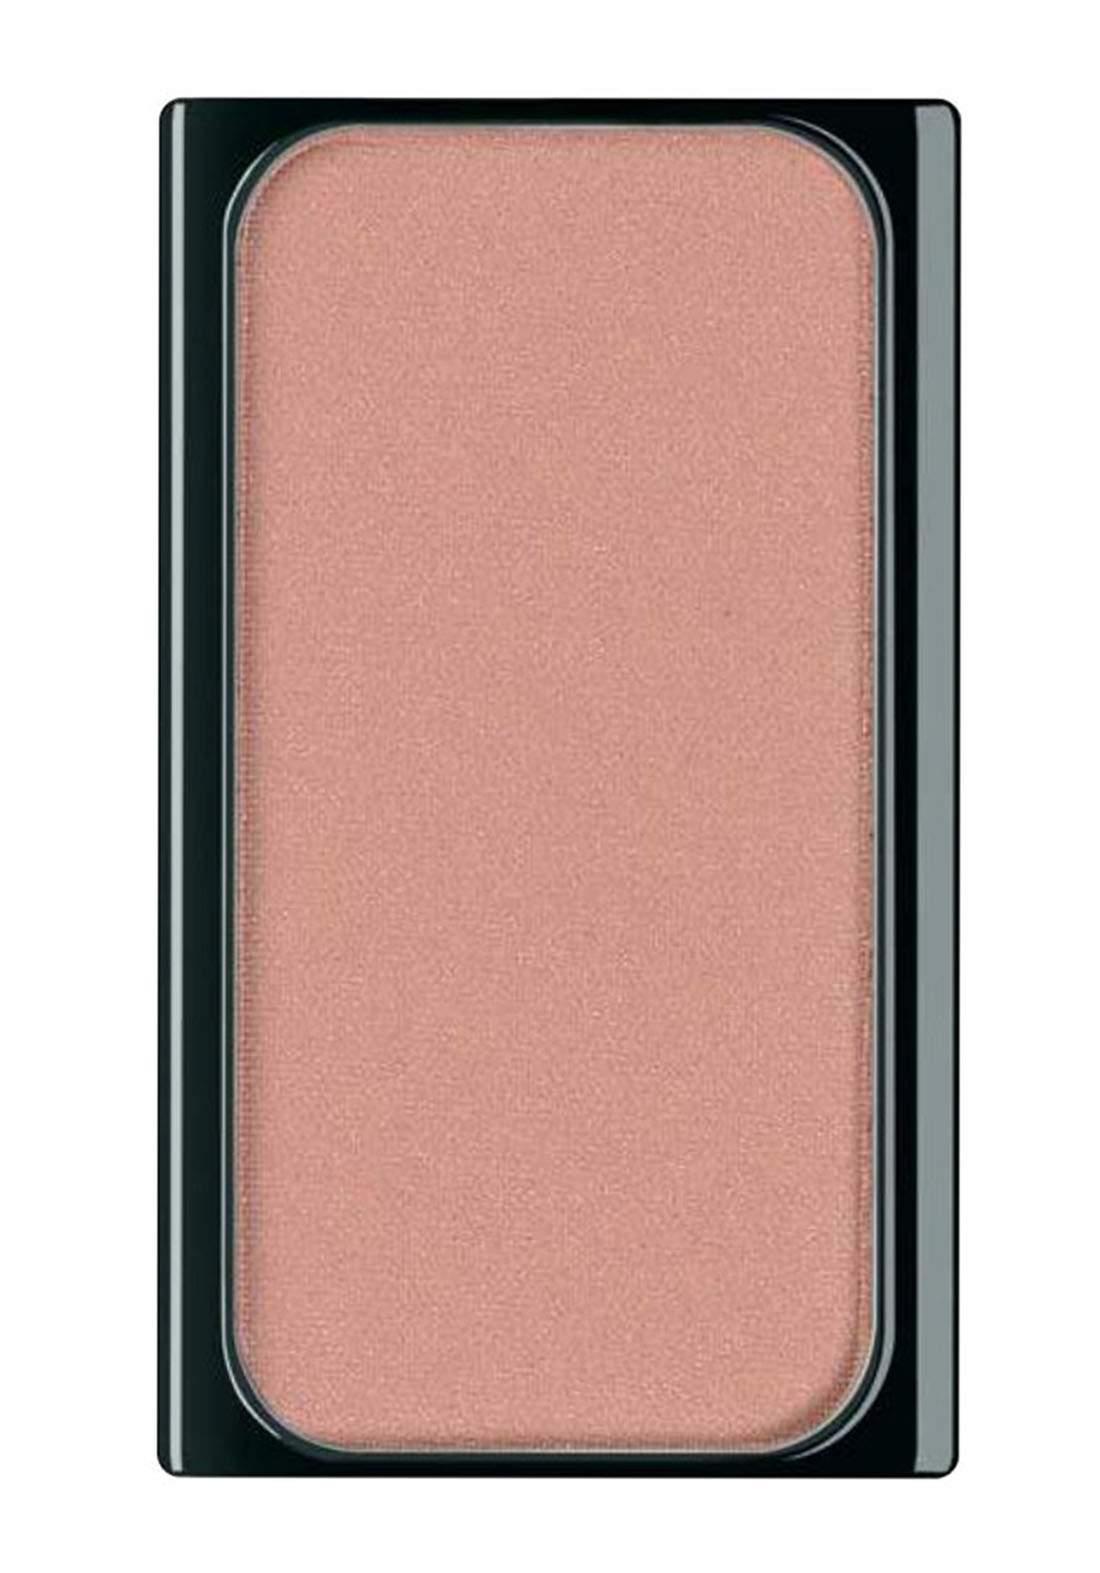 Artdeco Blusher No. 18 Beige Rose blush 5 g  احمر خدود